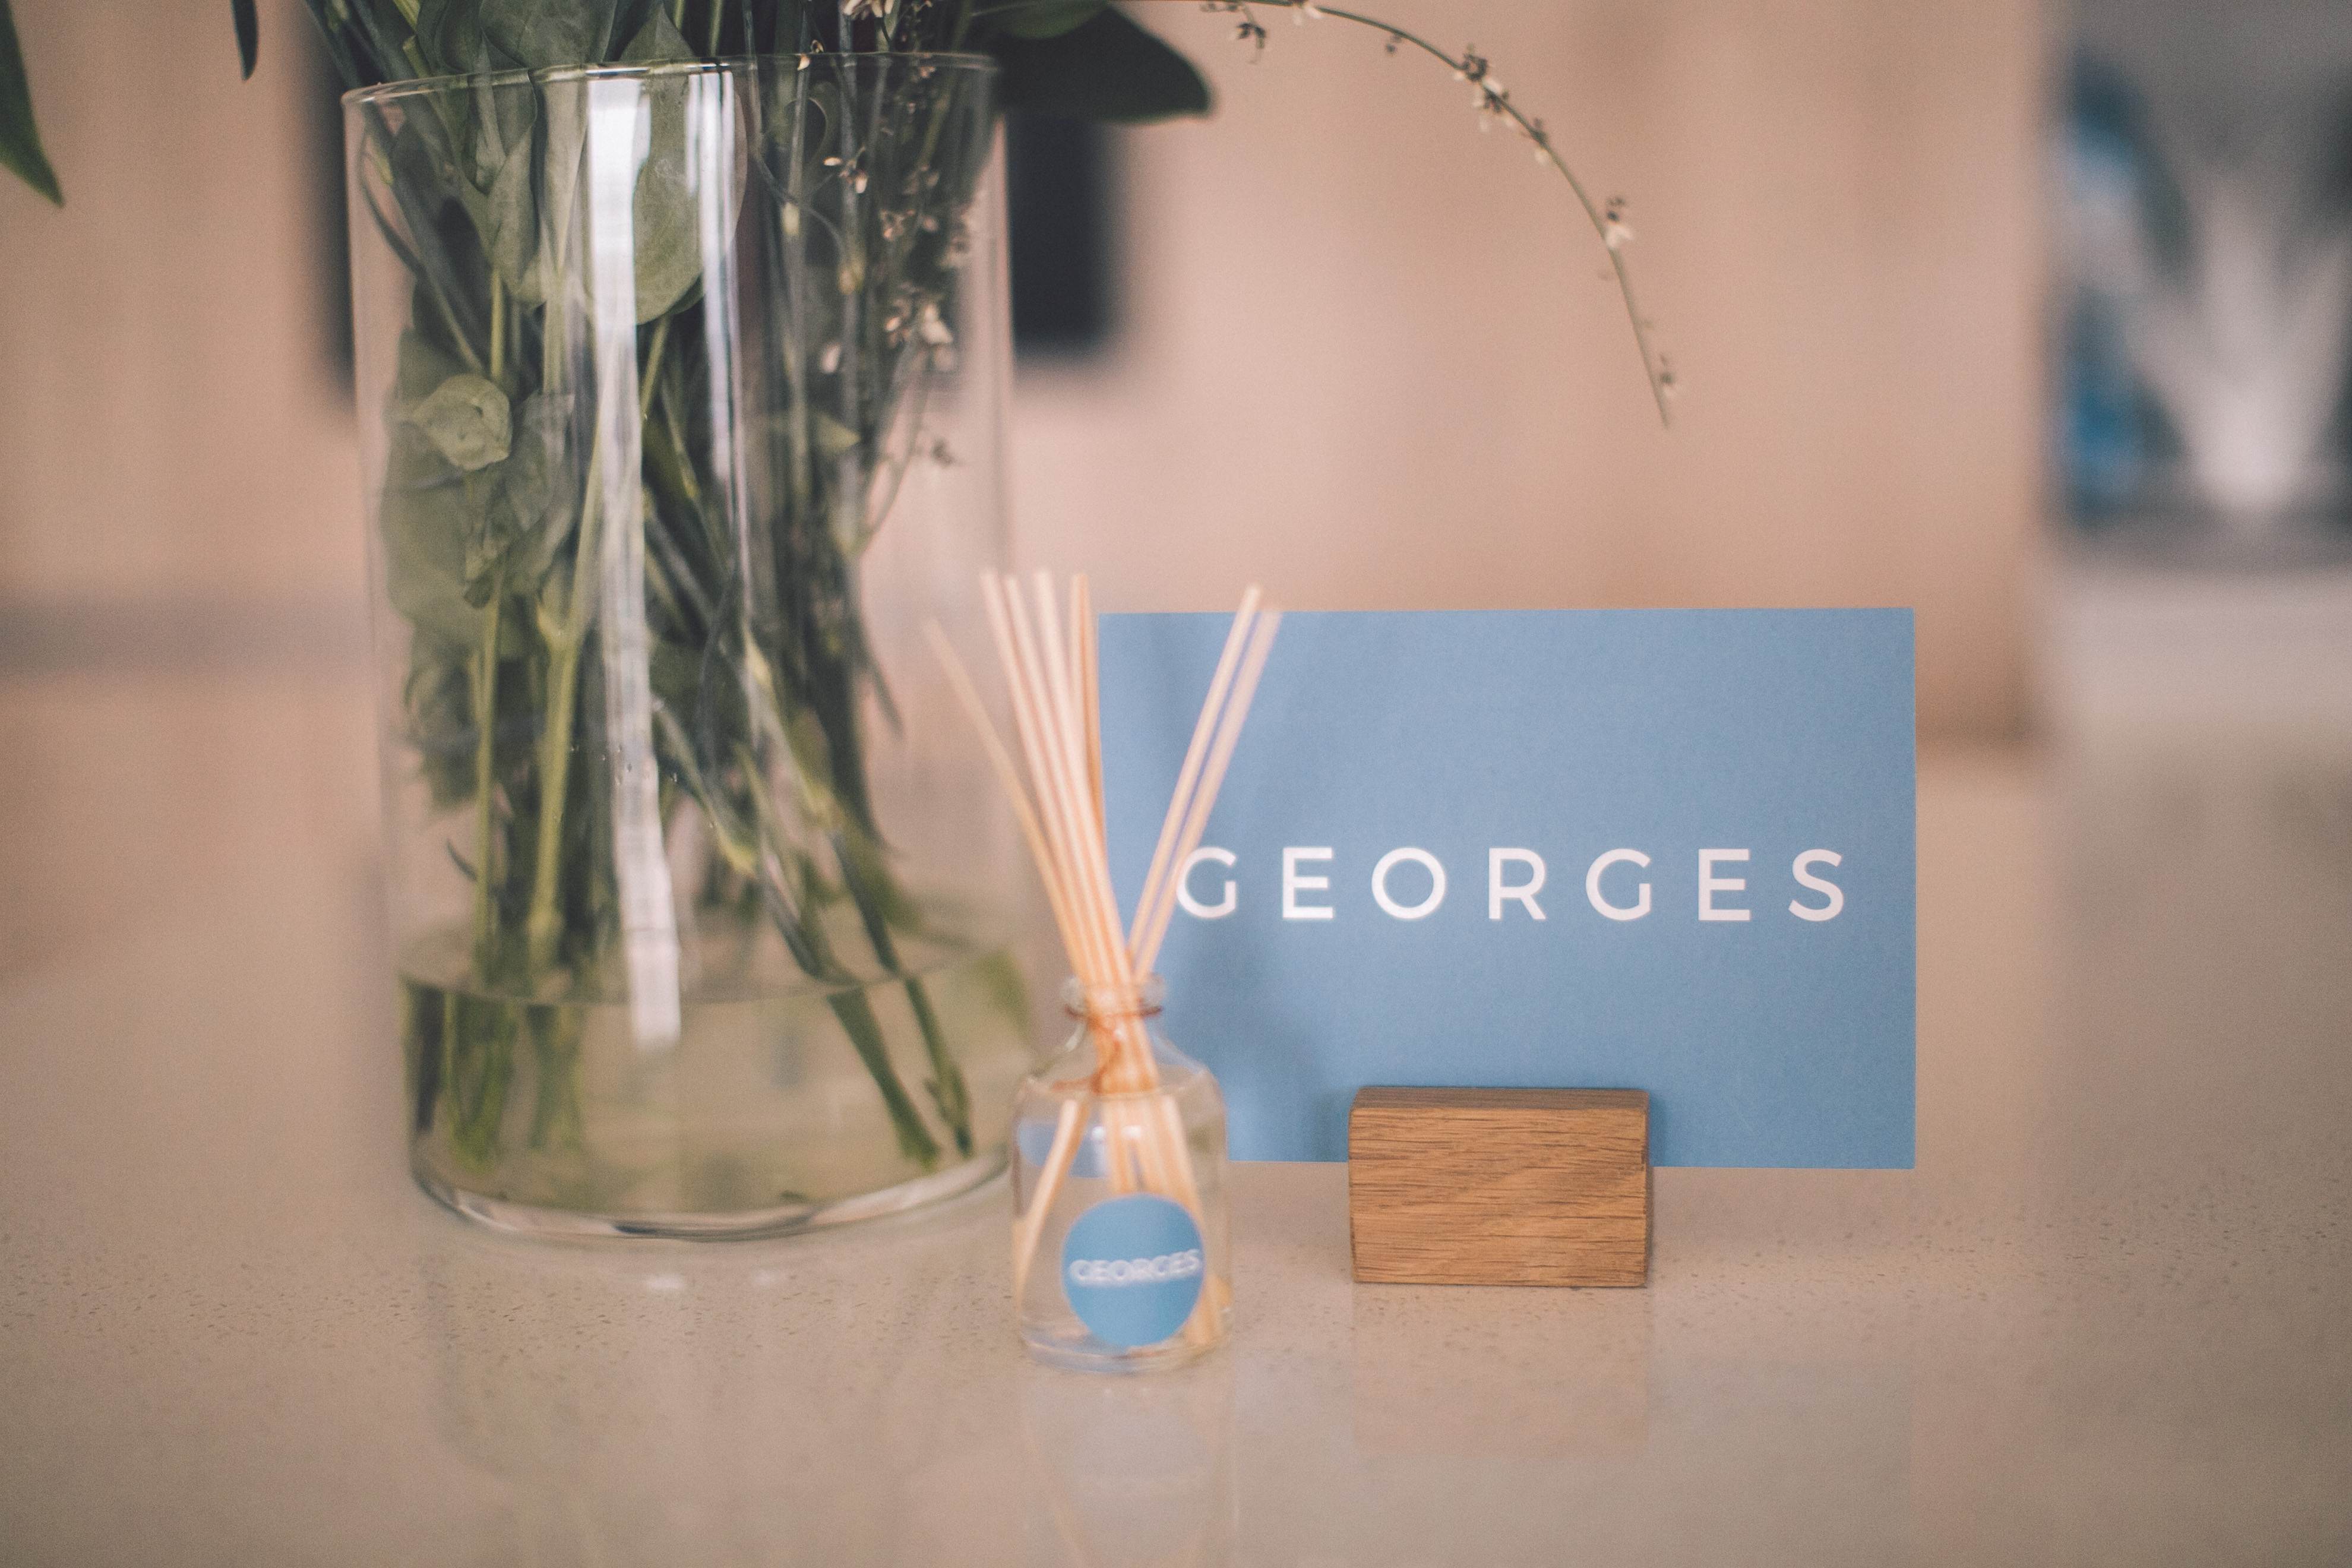 GEORGES-2508